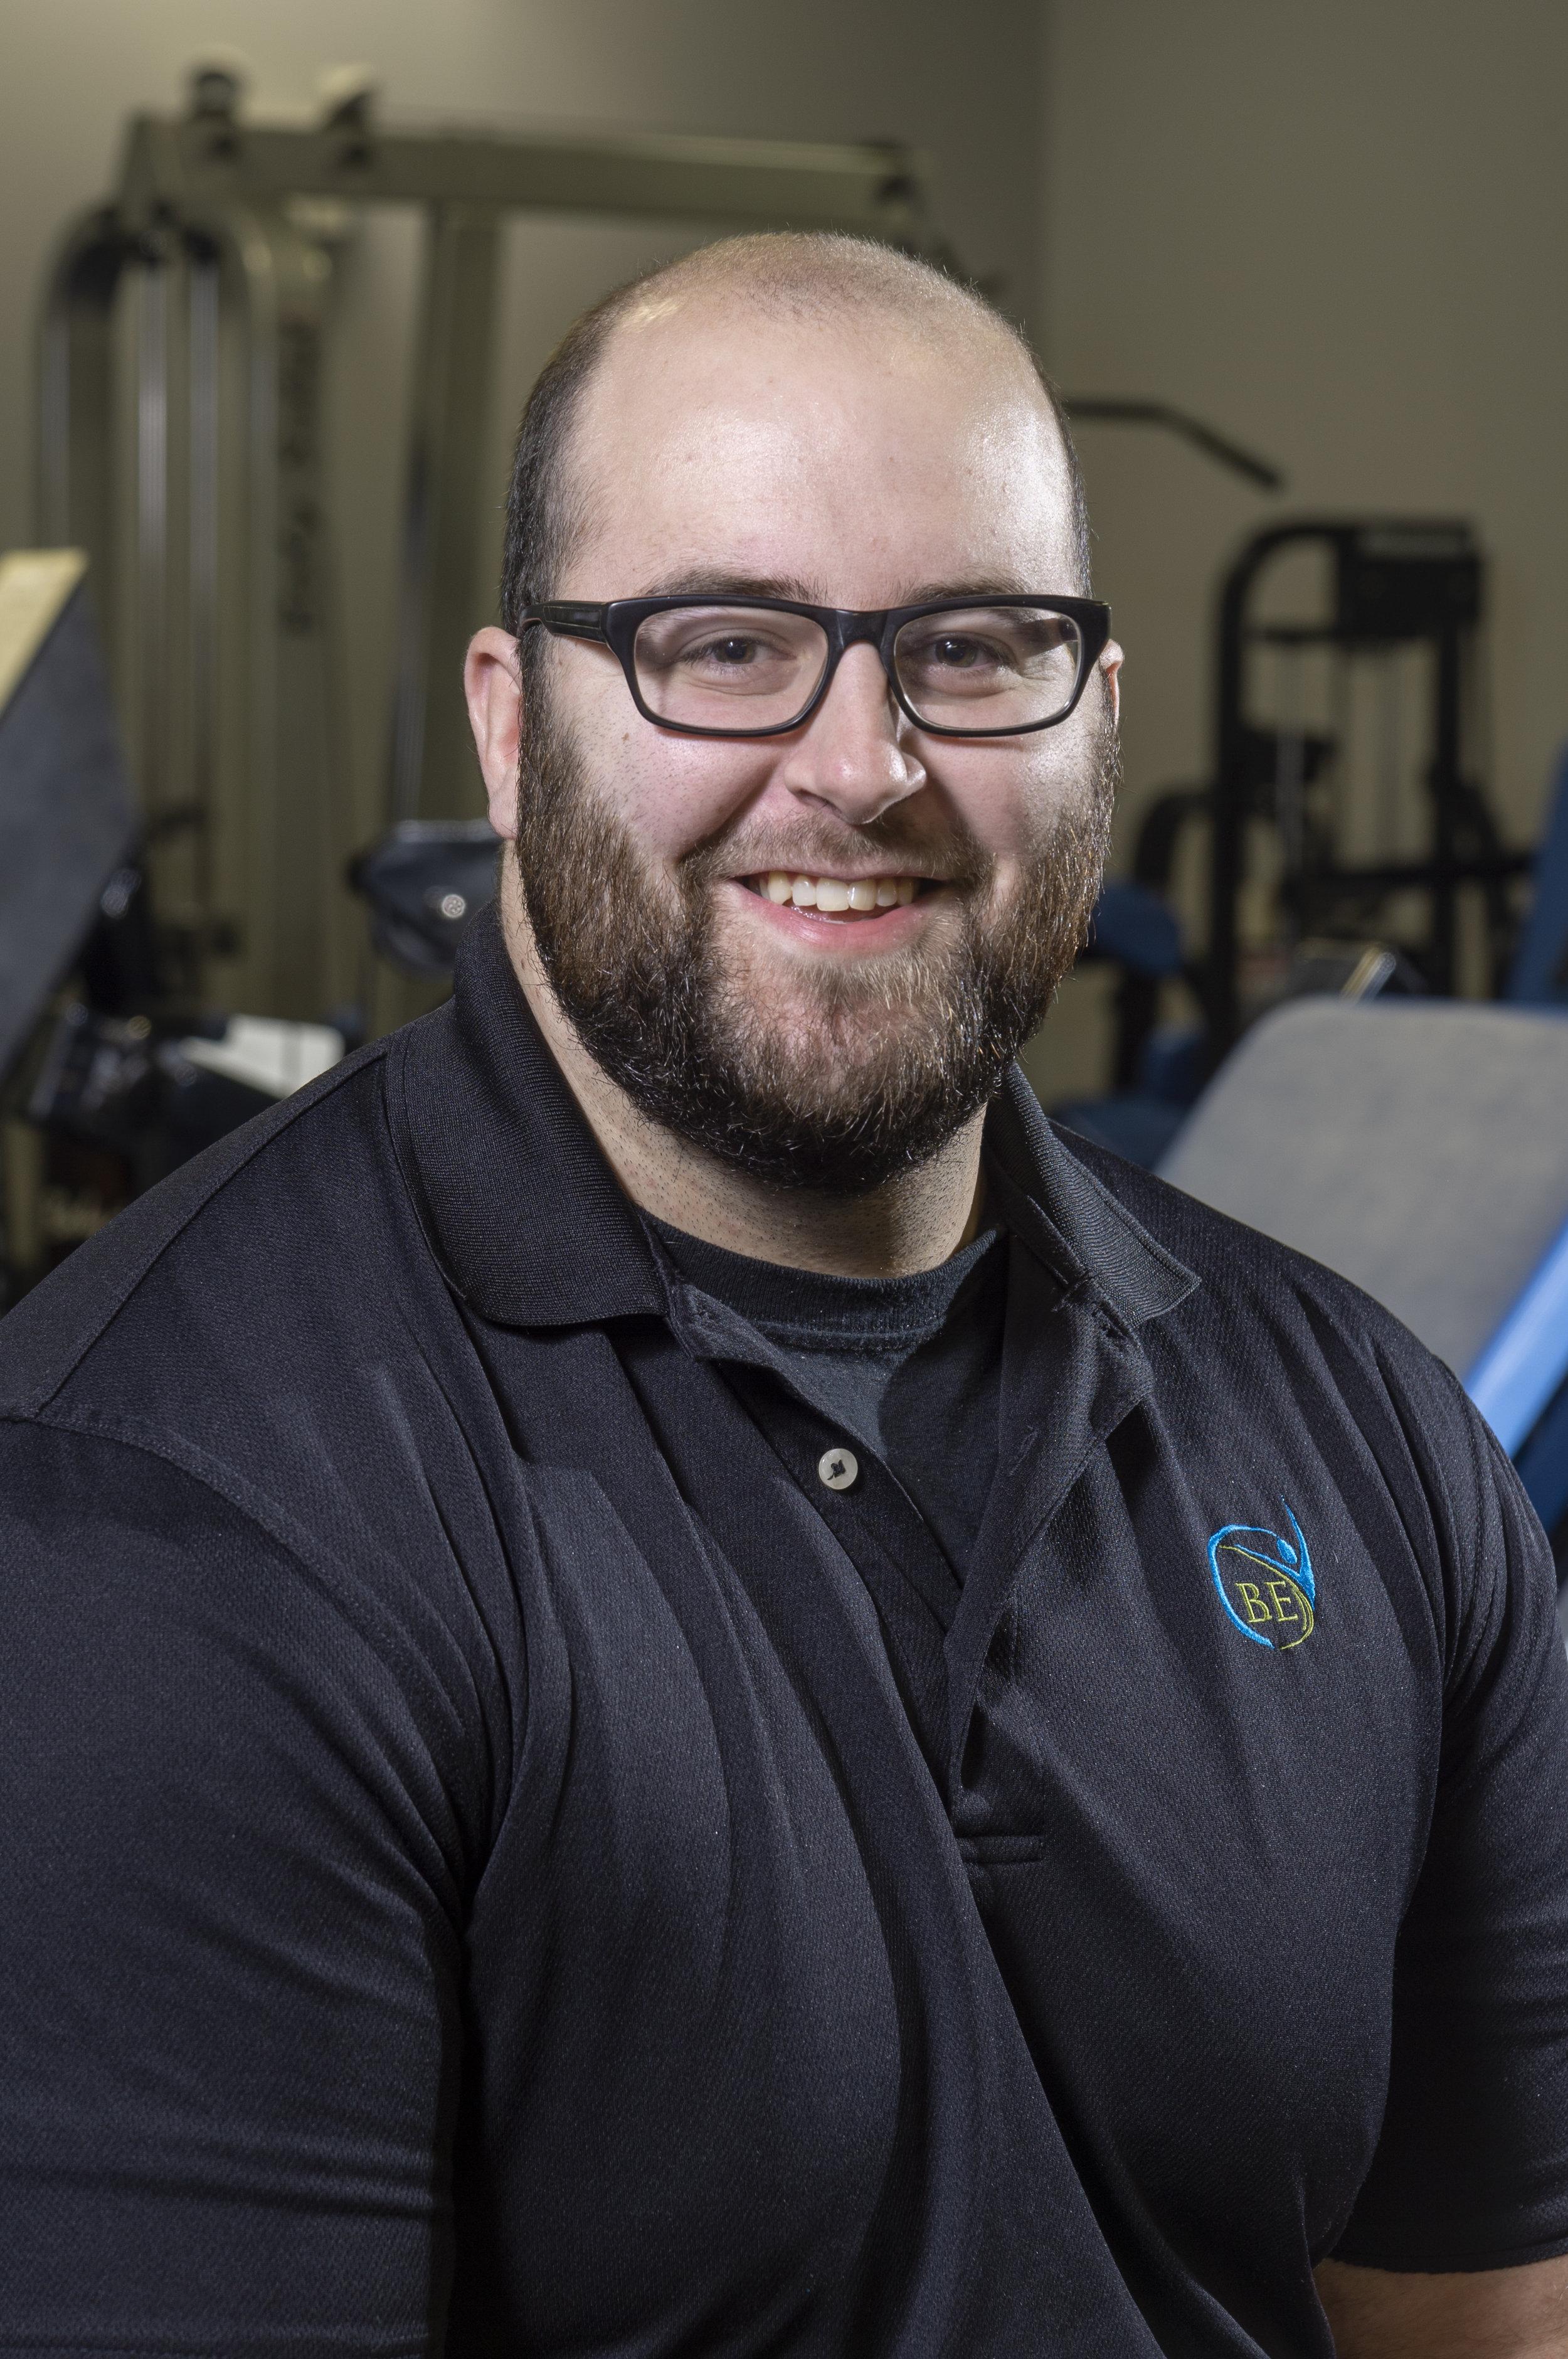 Body Elite Personal Trainer, Sean Willitts